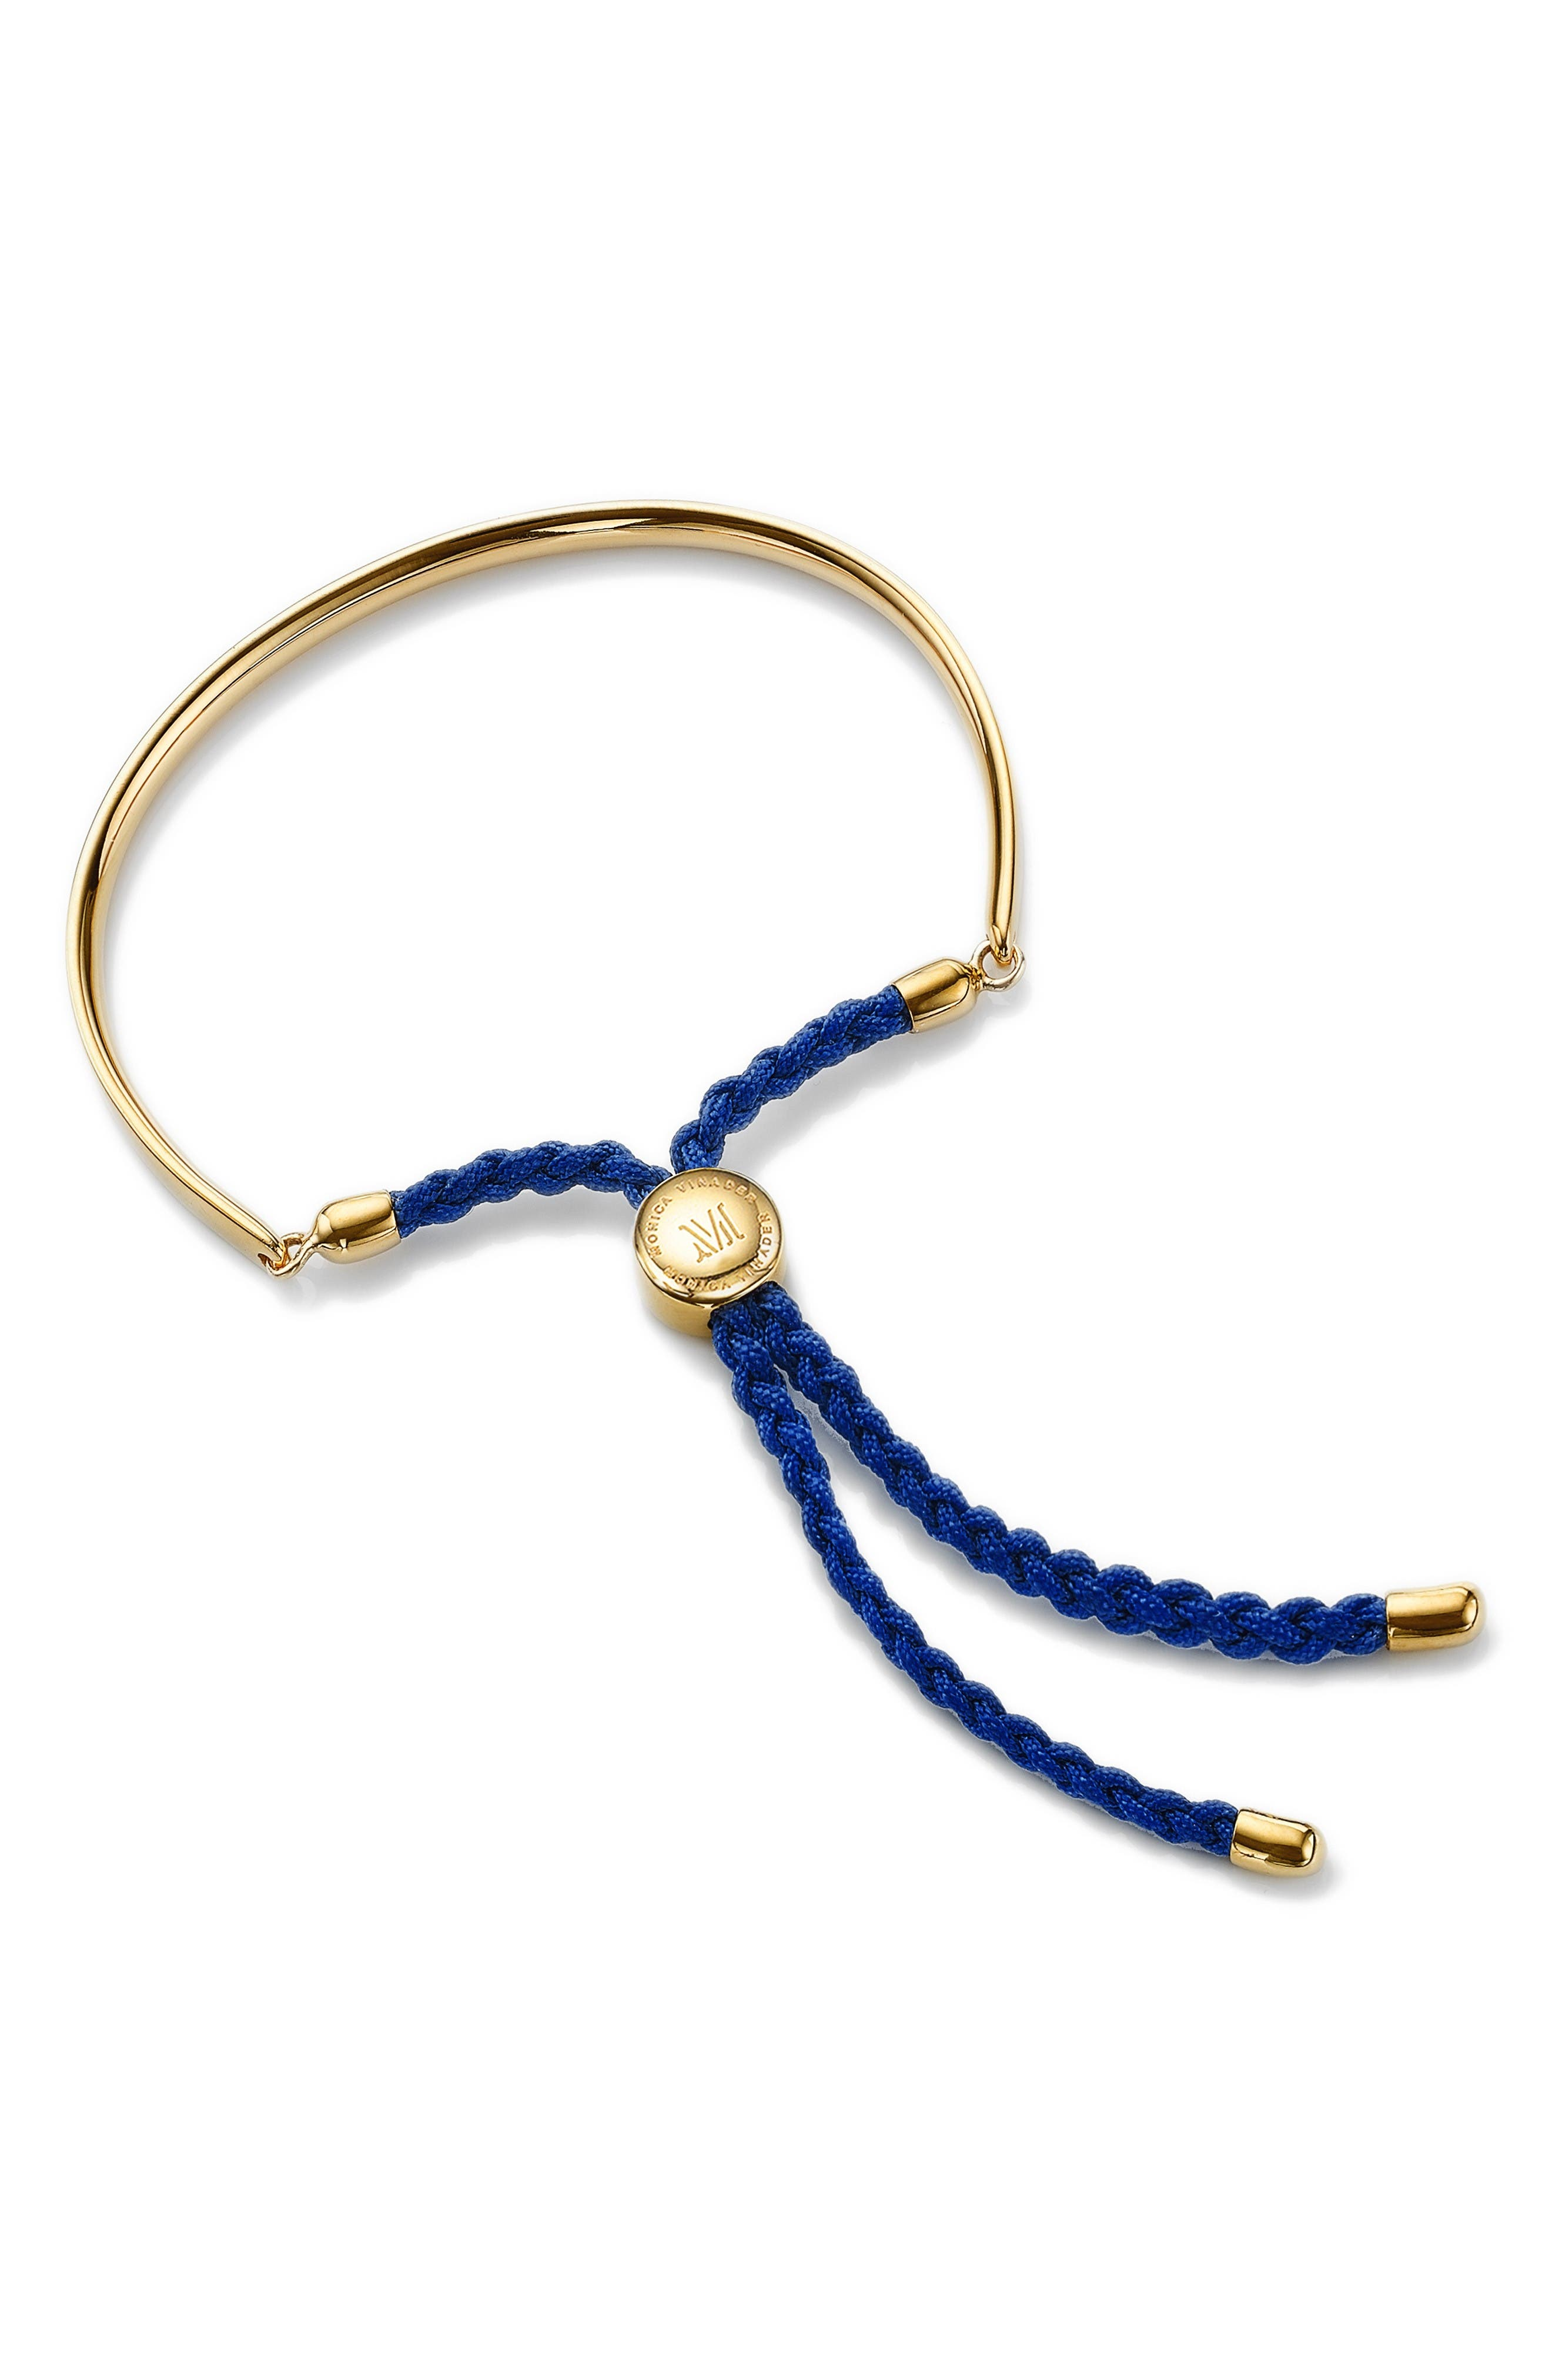 Alternate Image 1 Selected - Monica Vinader 'Fiji' Friendship Bracelet